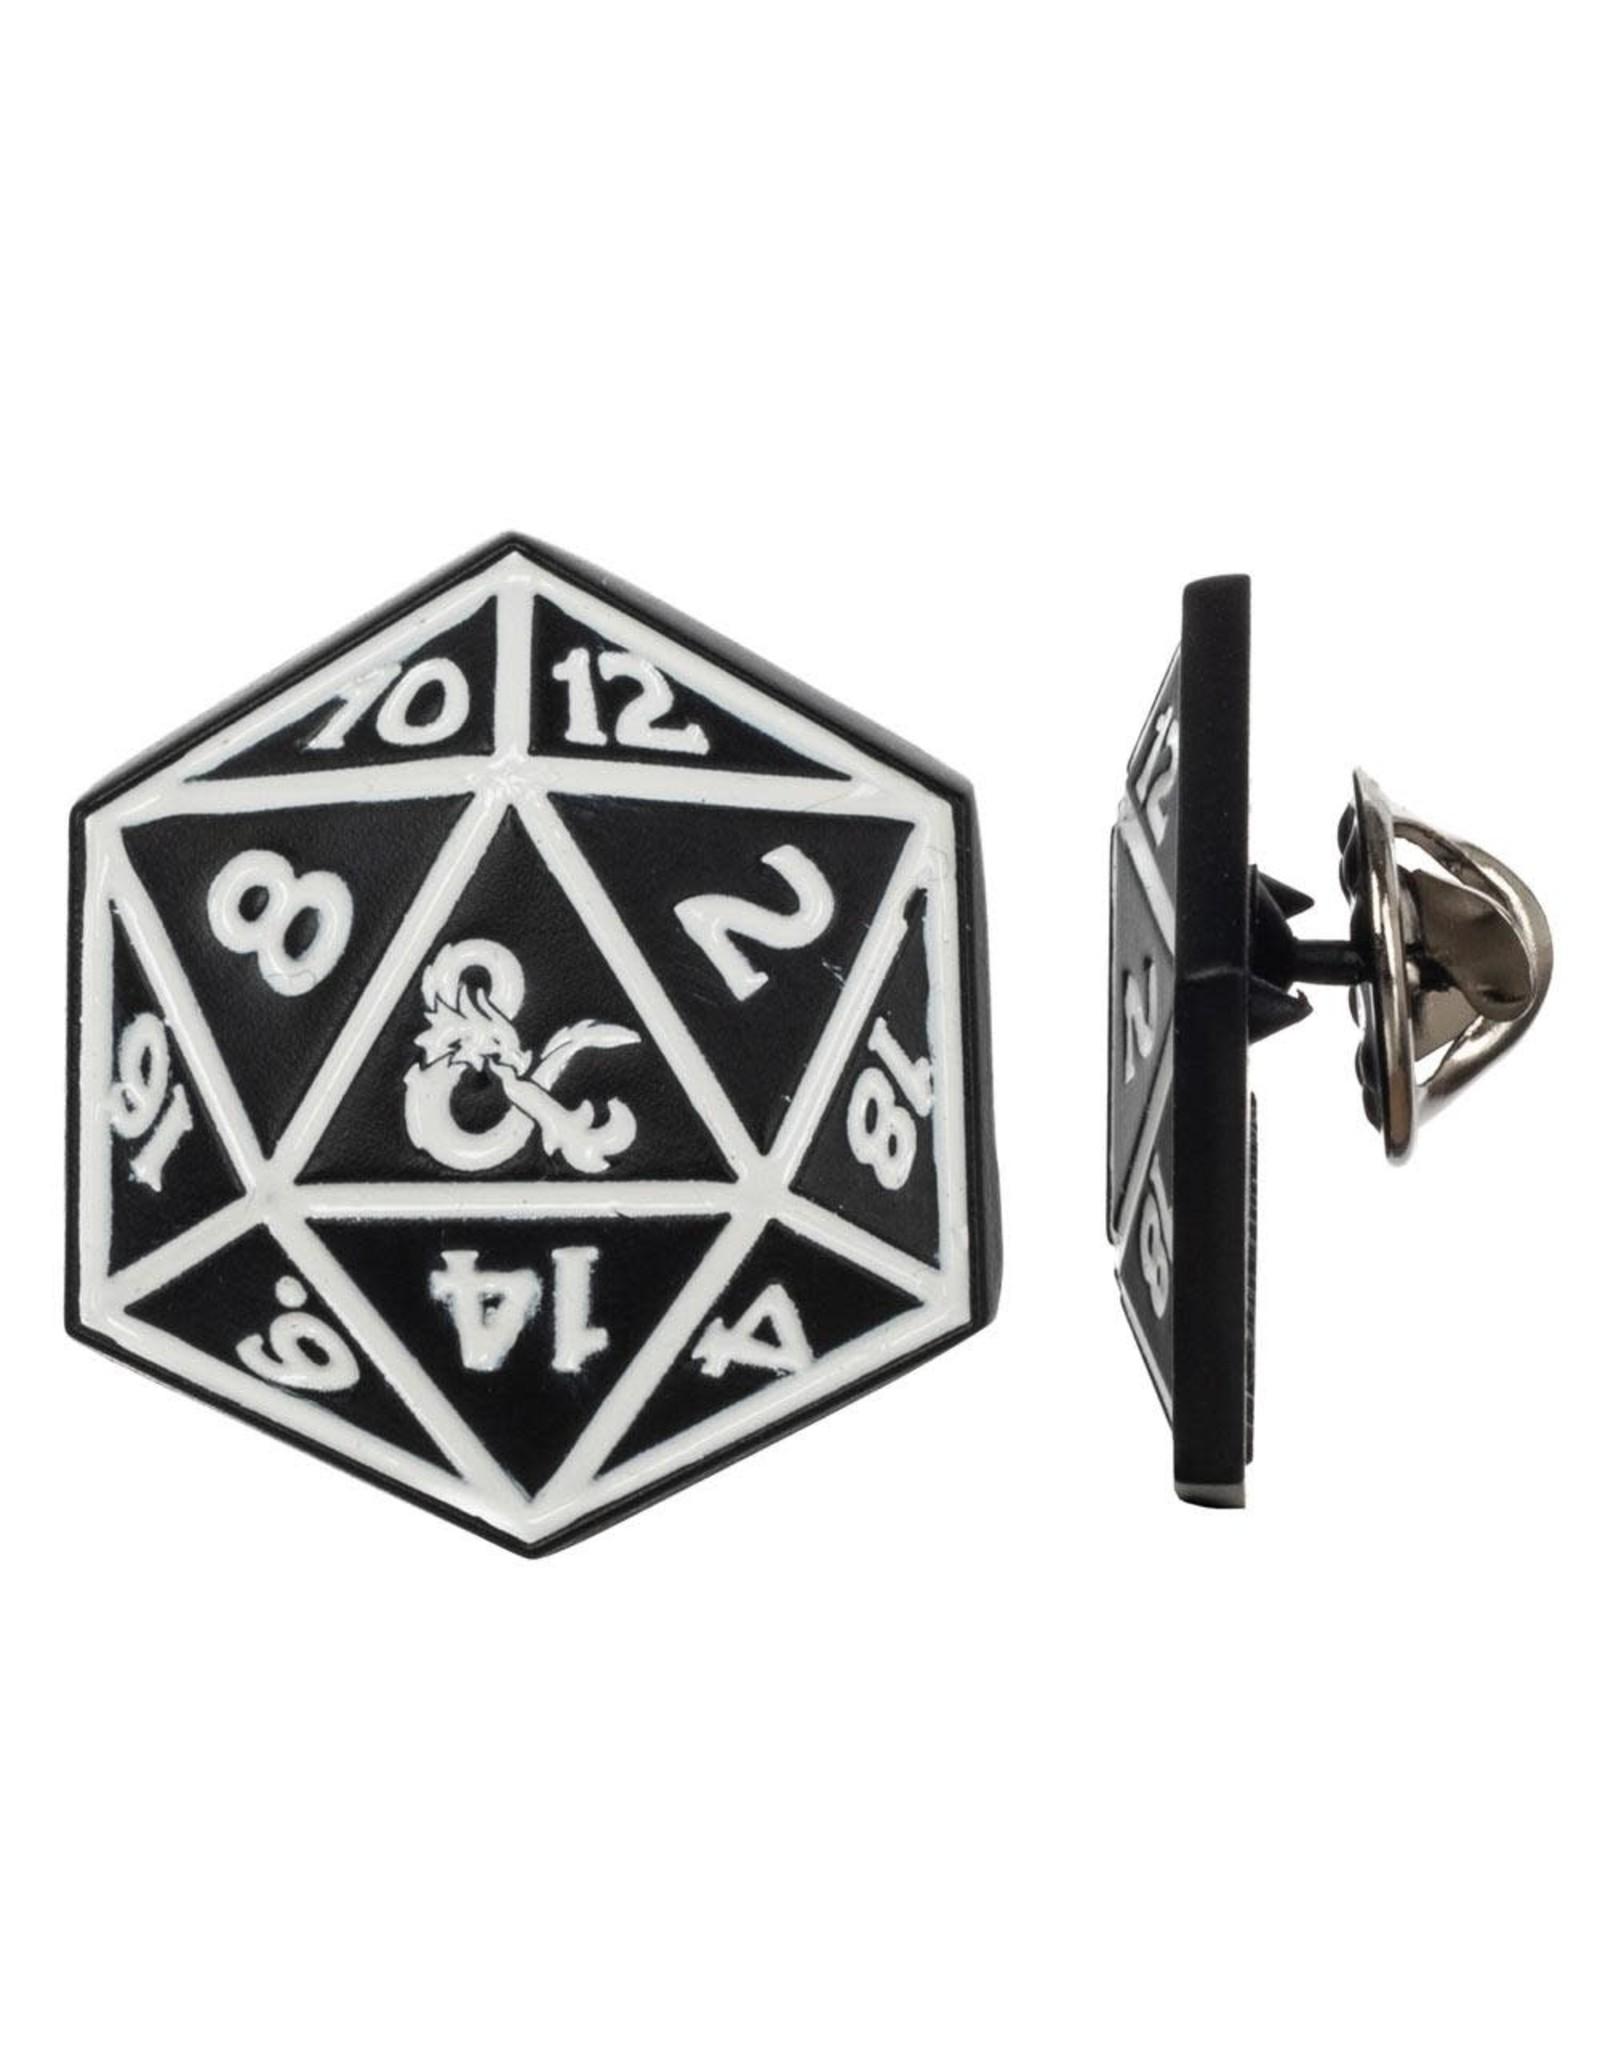 Bioworld Dungeons & Dragons Lapel Pin